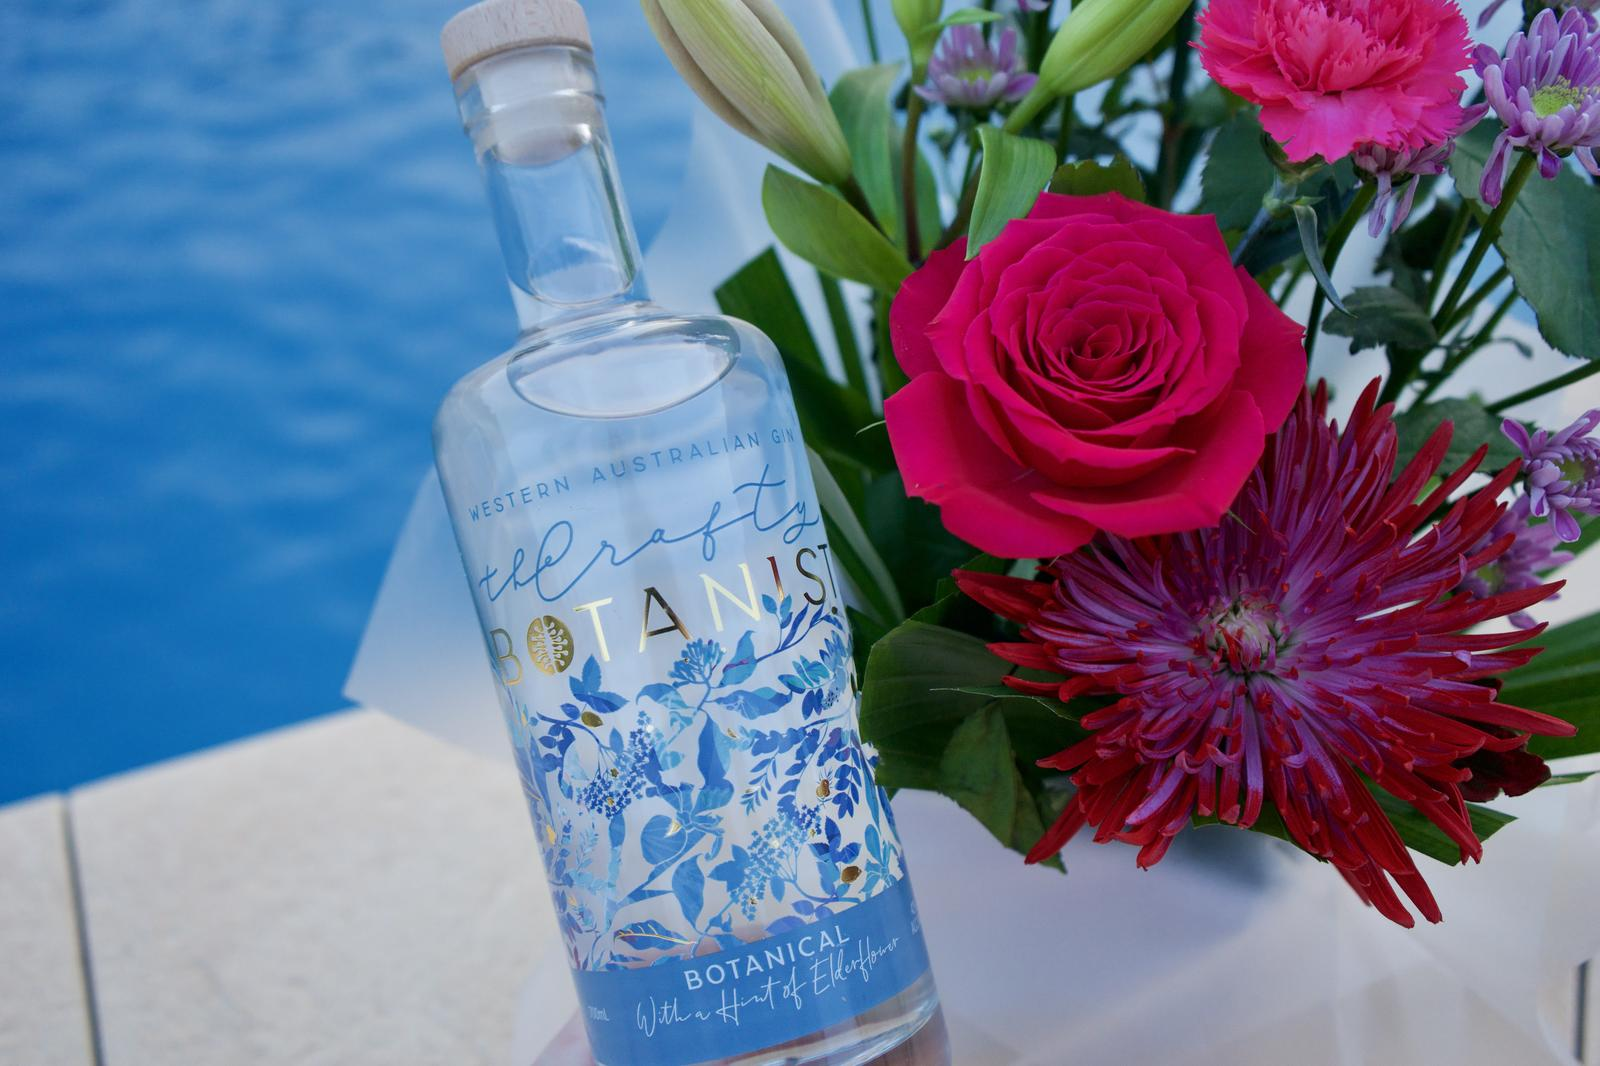 The Crafty Botanist Gin